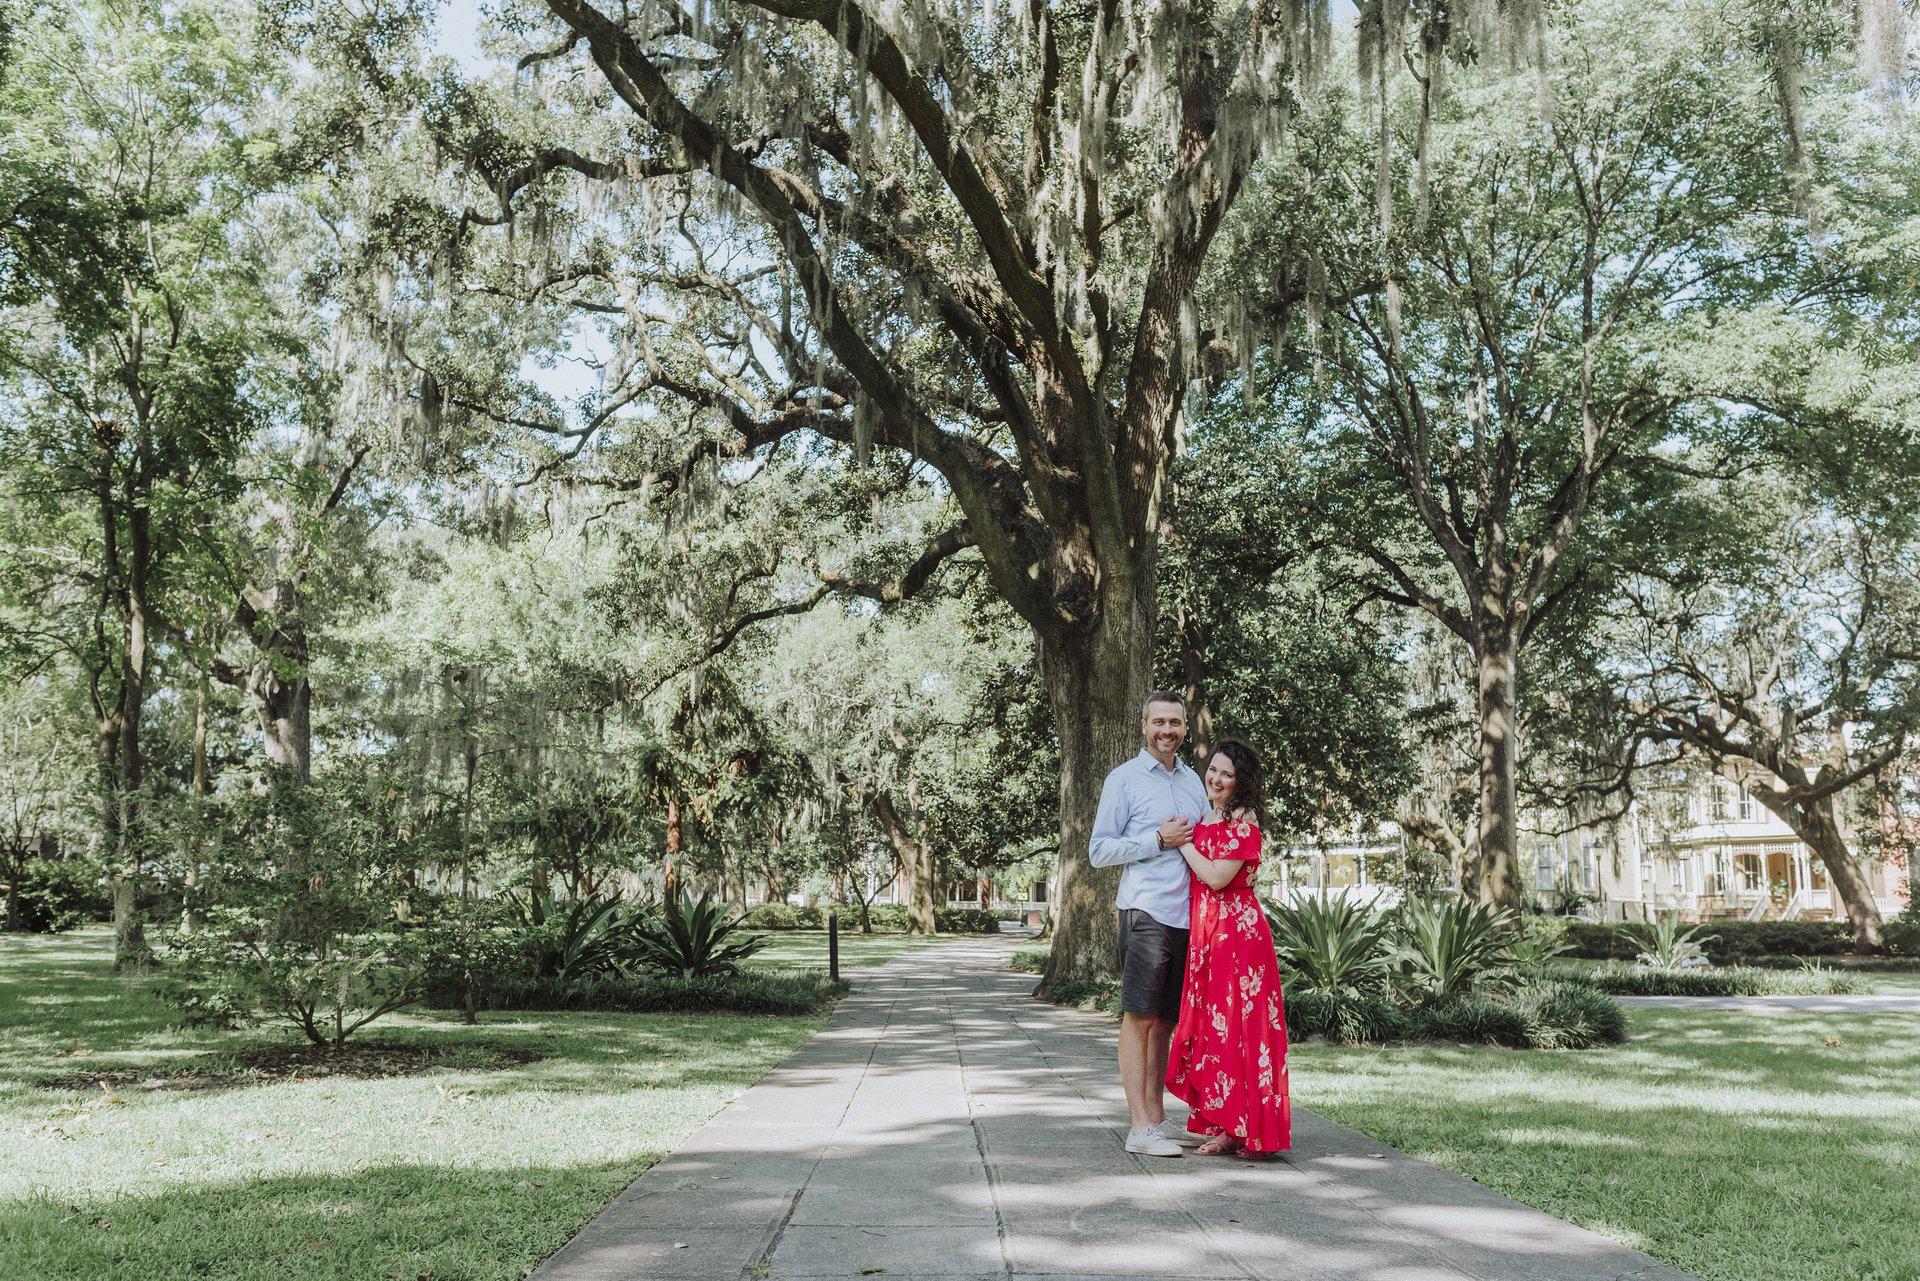 Savannah-United States-travel-story-Flytographer-25